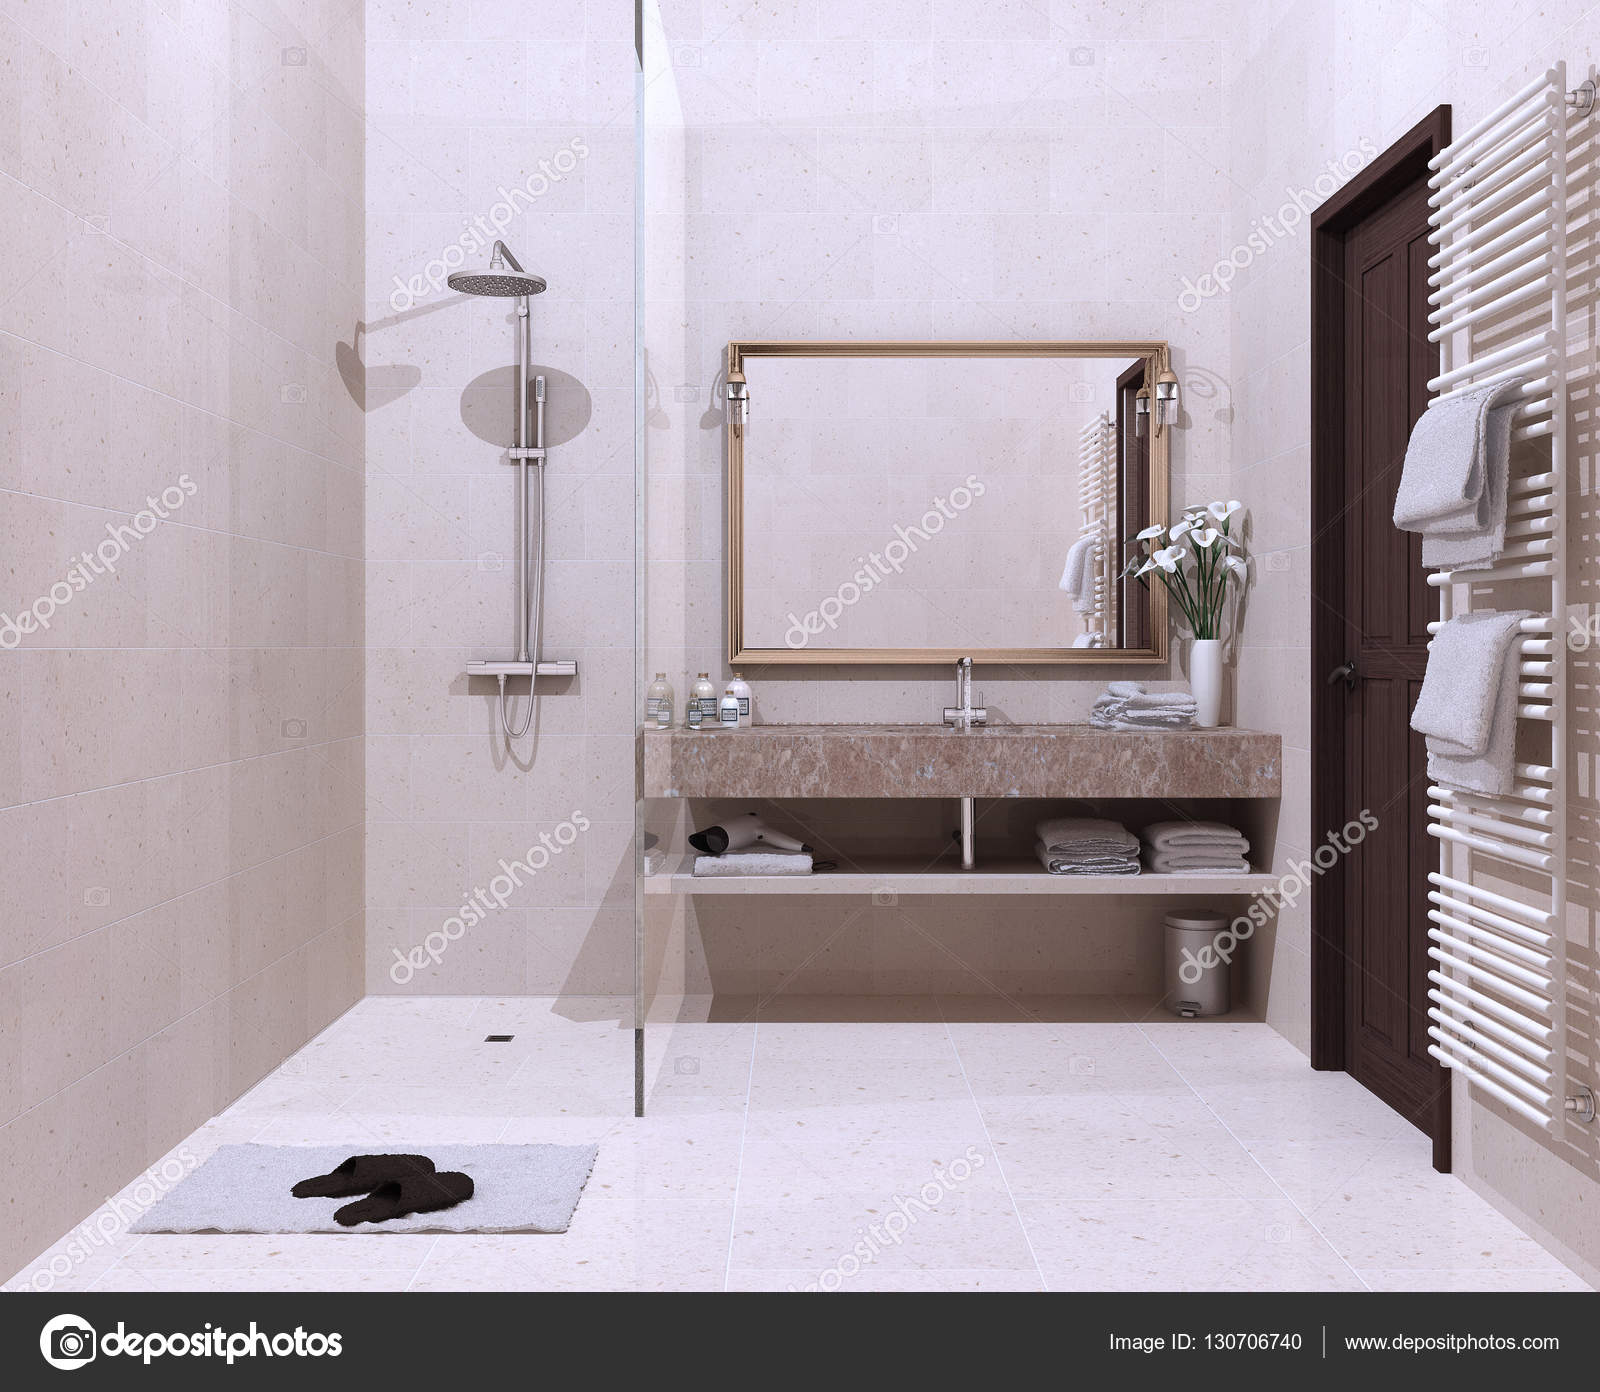 Klassieke badkamer, hotel, resort — Stockfoto © ArchiVIz #130706740